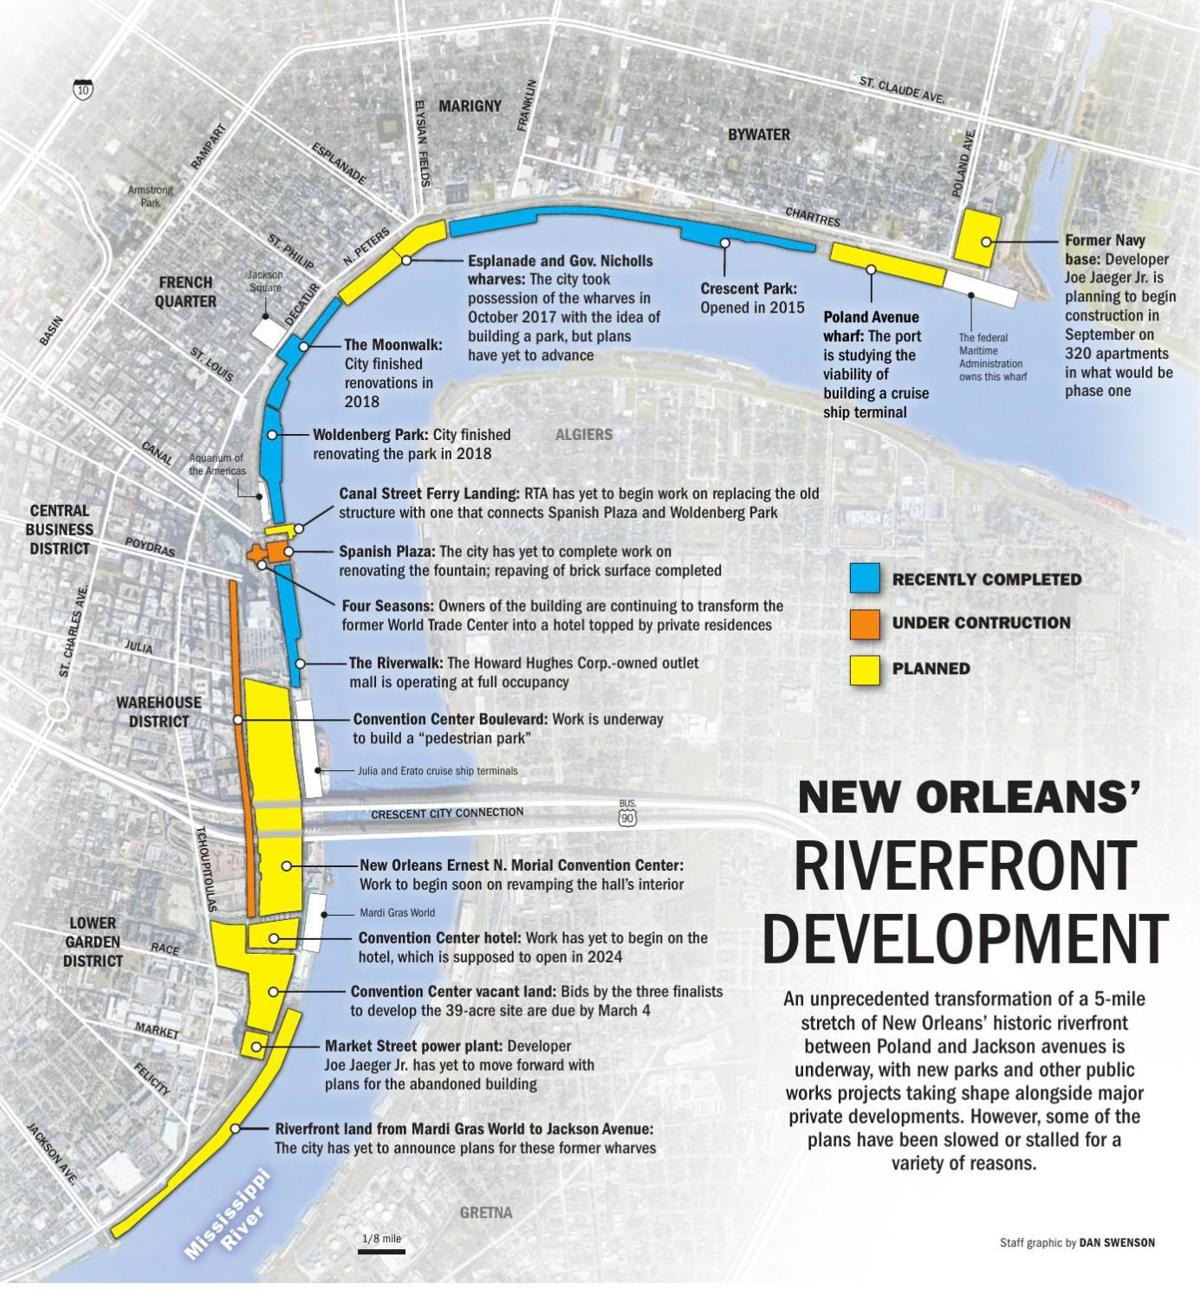 New Orleans riverfront development map